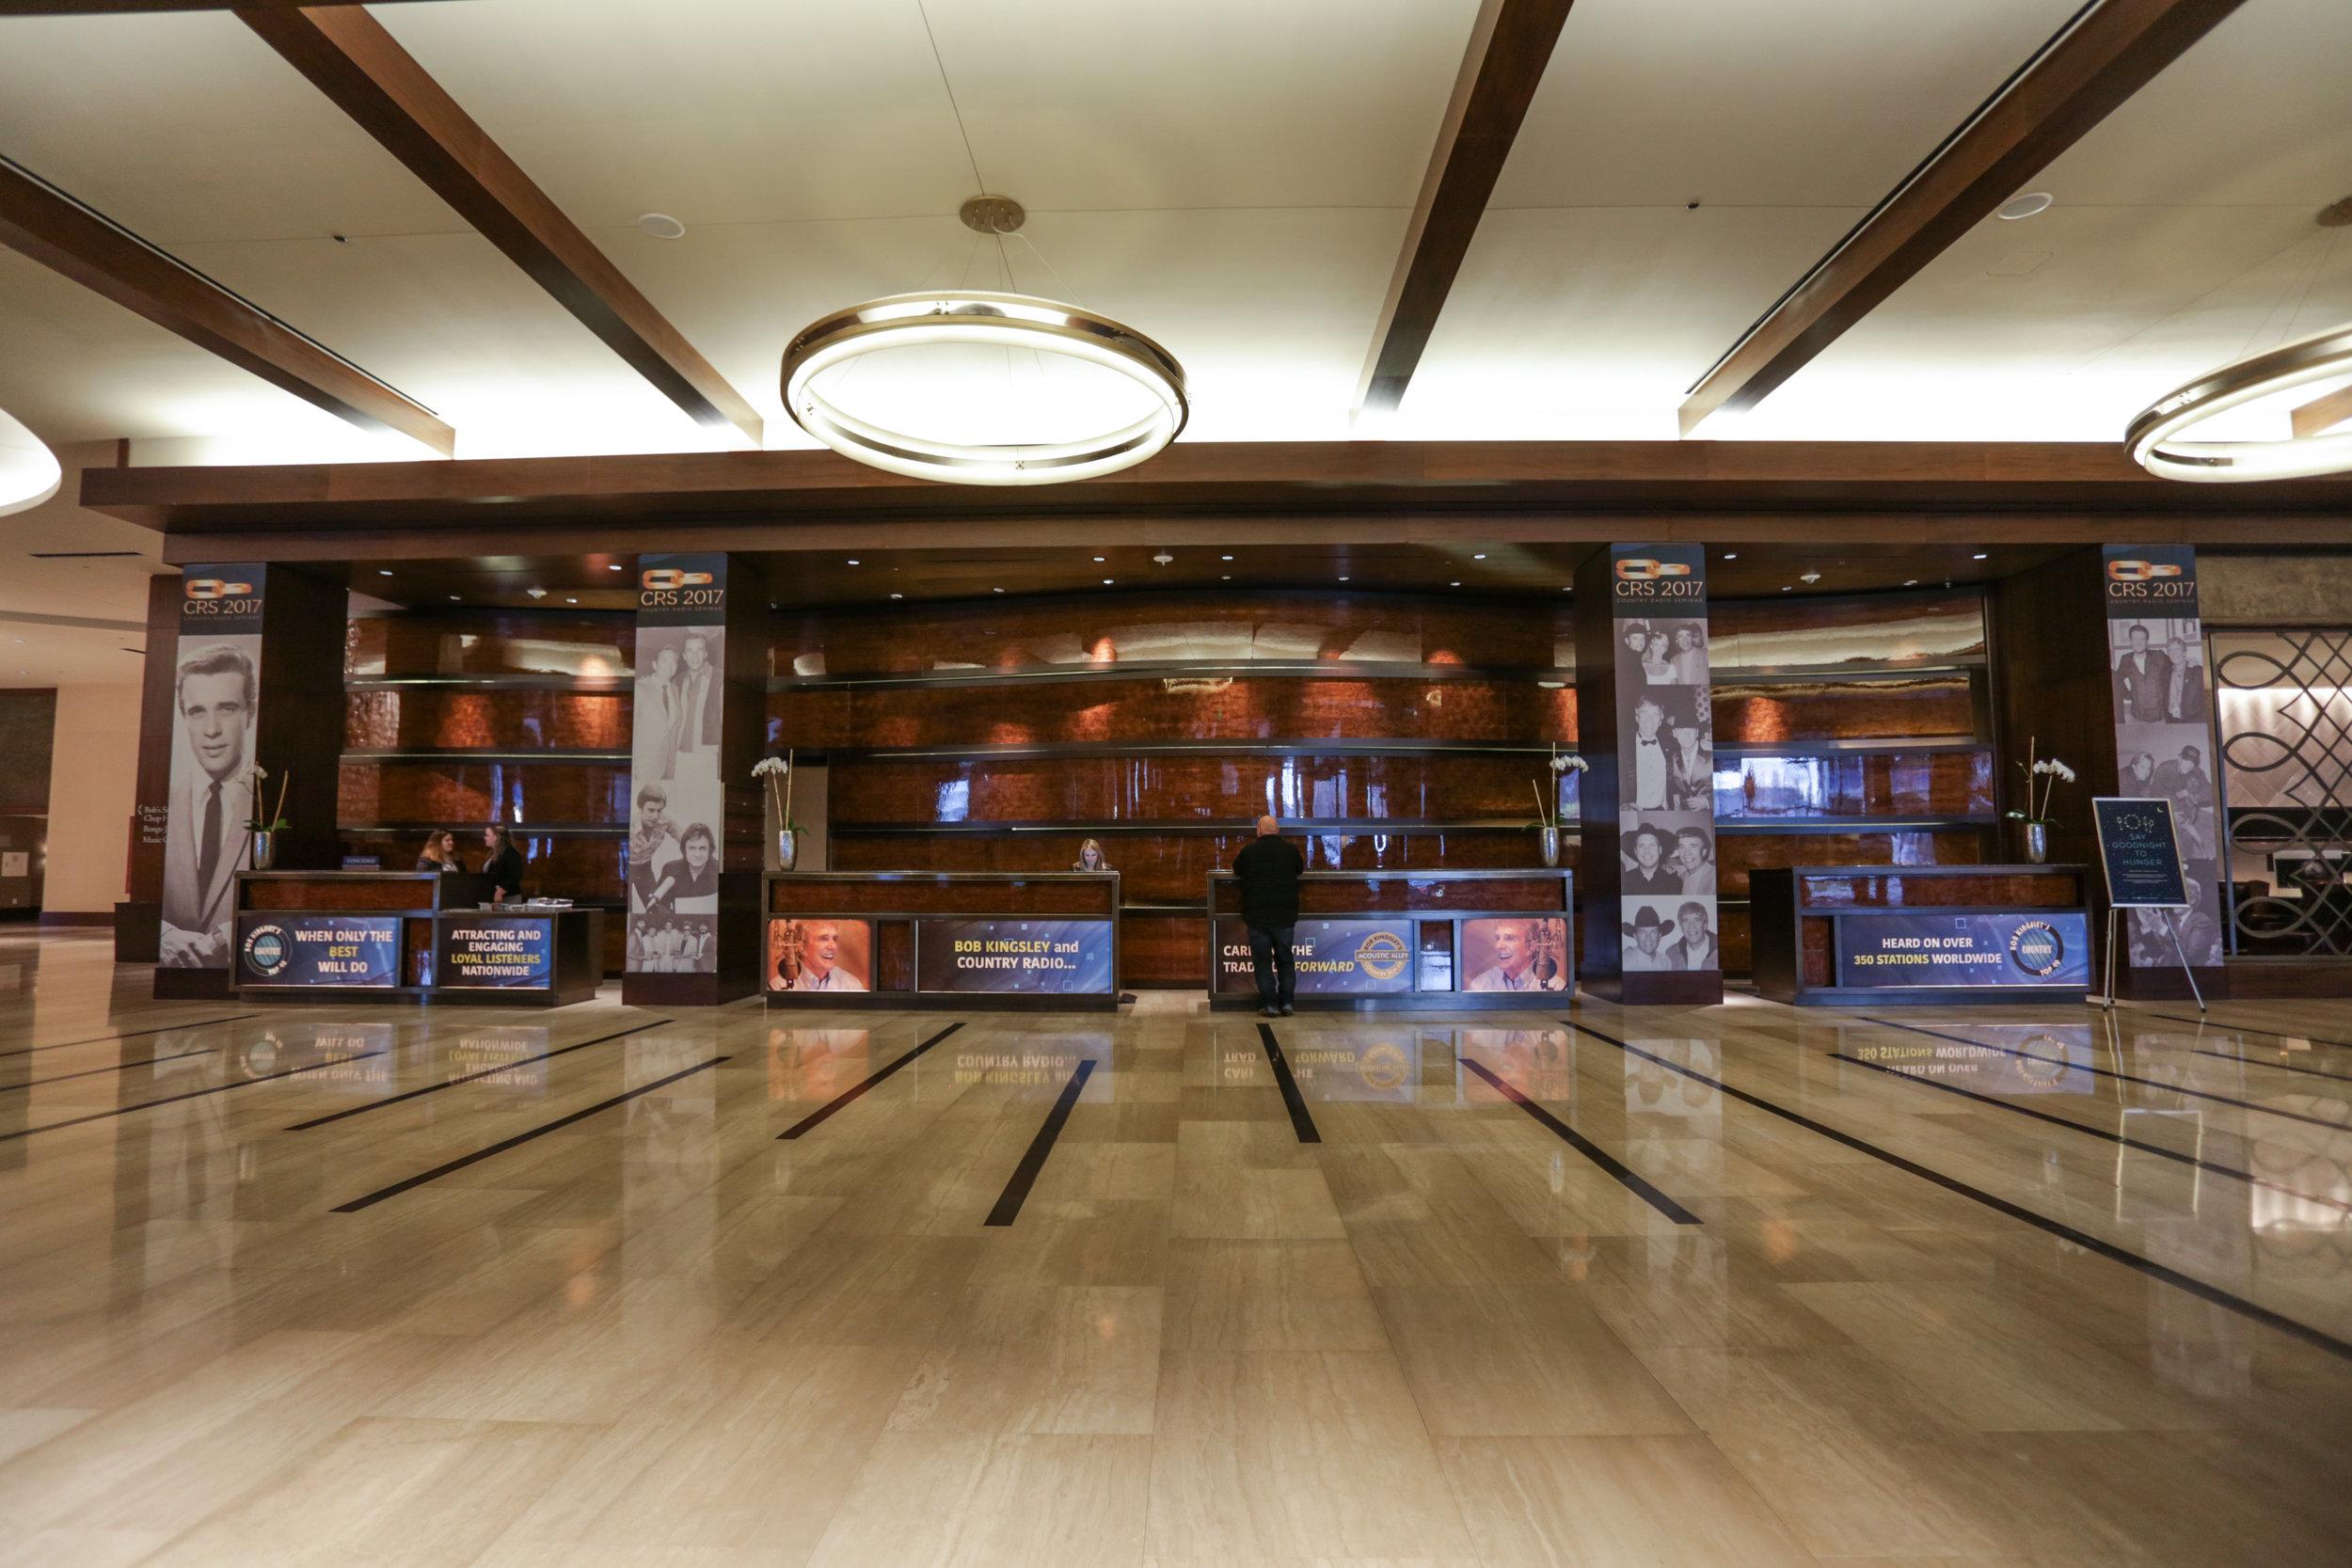 Hotel Check-In Column + Desk Clings